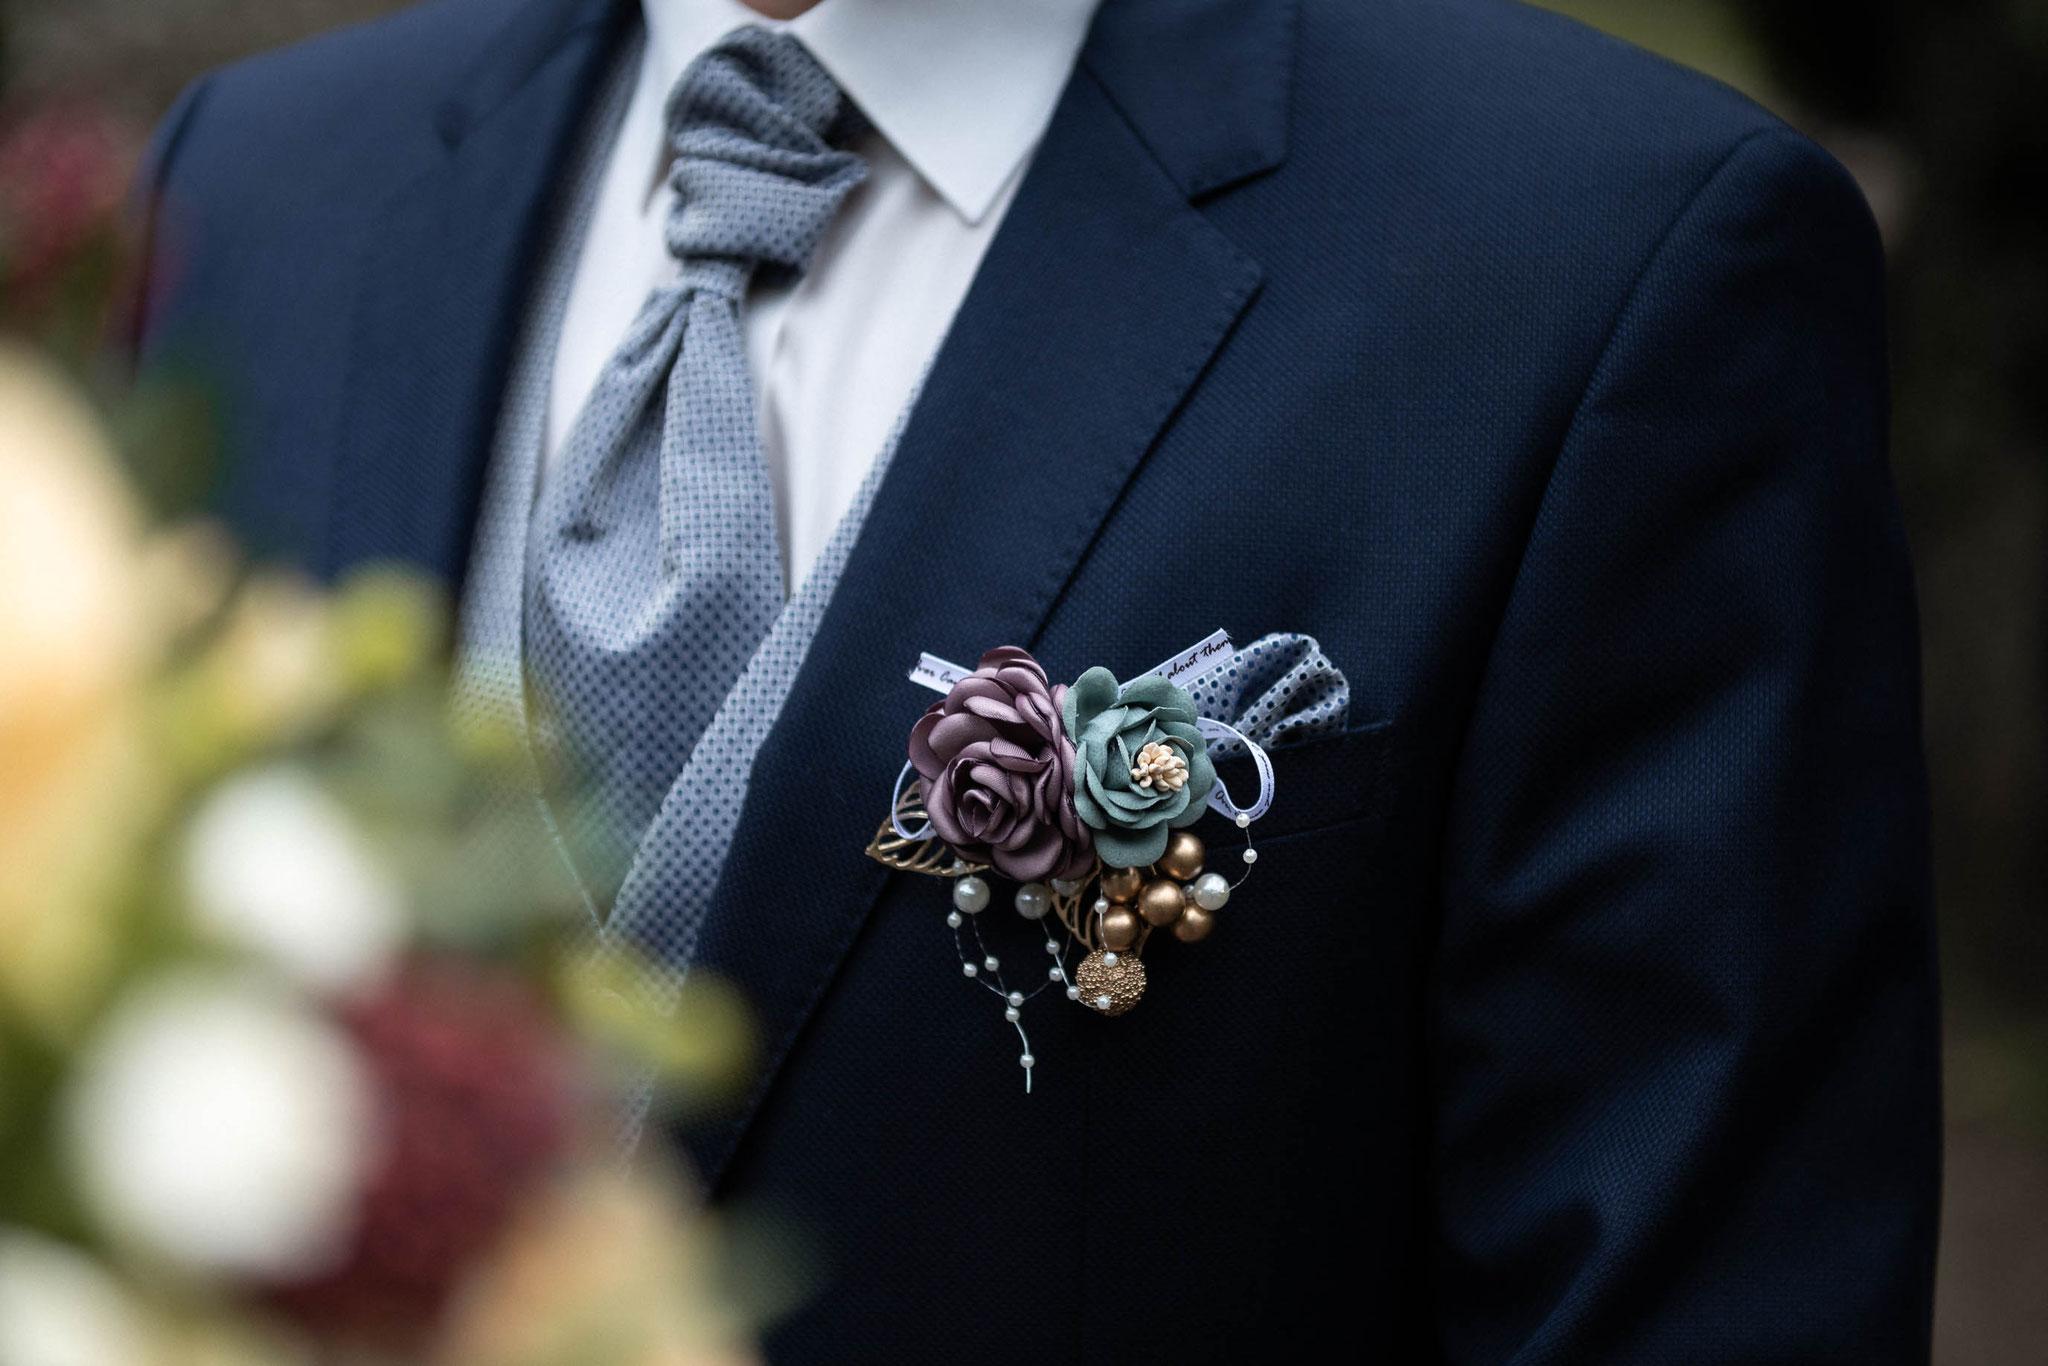 Detailaufnahmen des Bräutigams